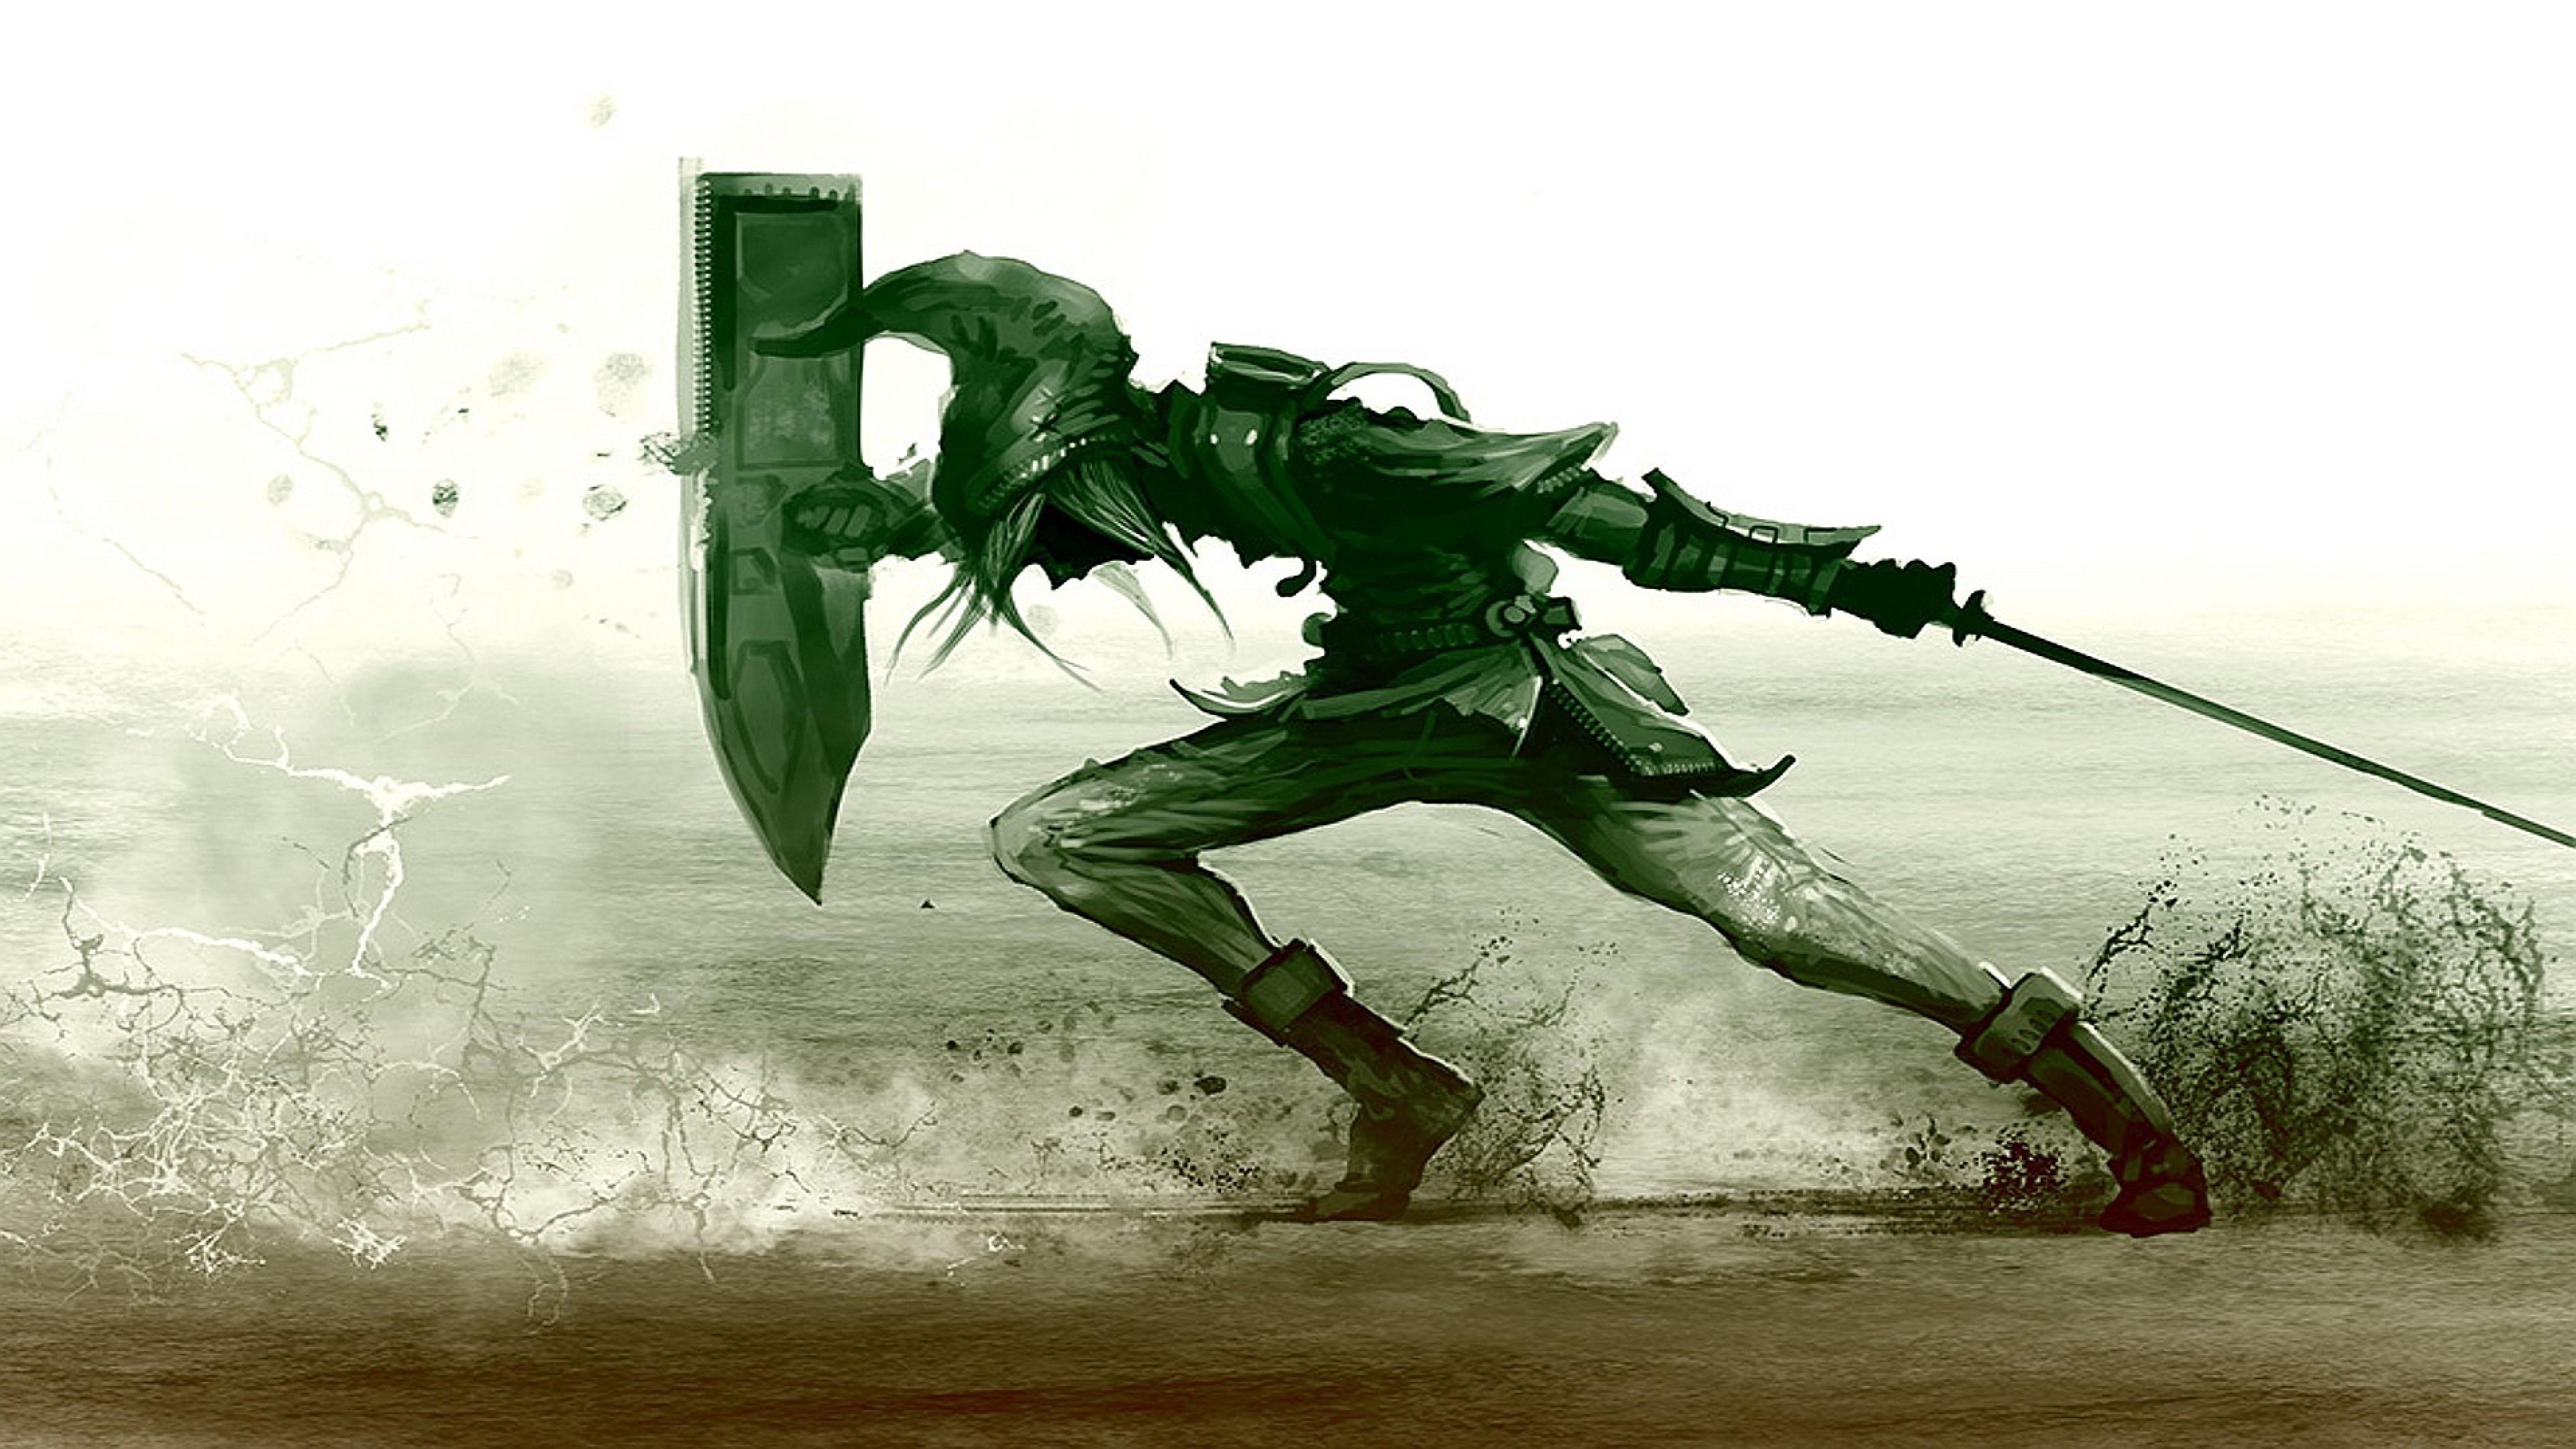 Wallpaper The legend of zelda, Shield, Sword, Sand, Link 4K .